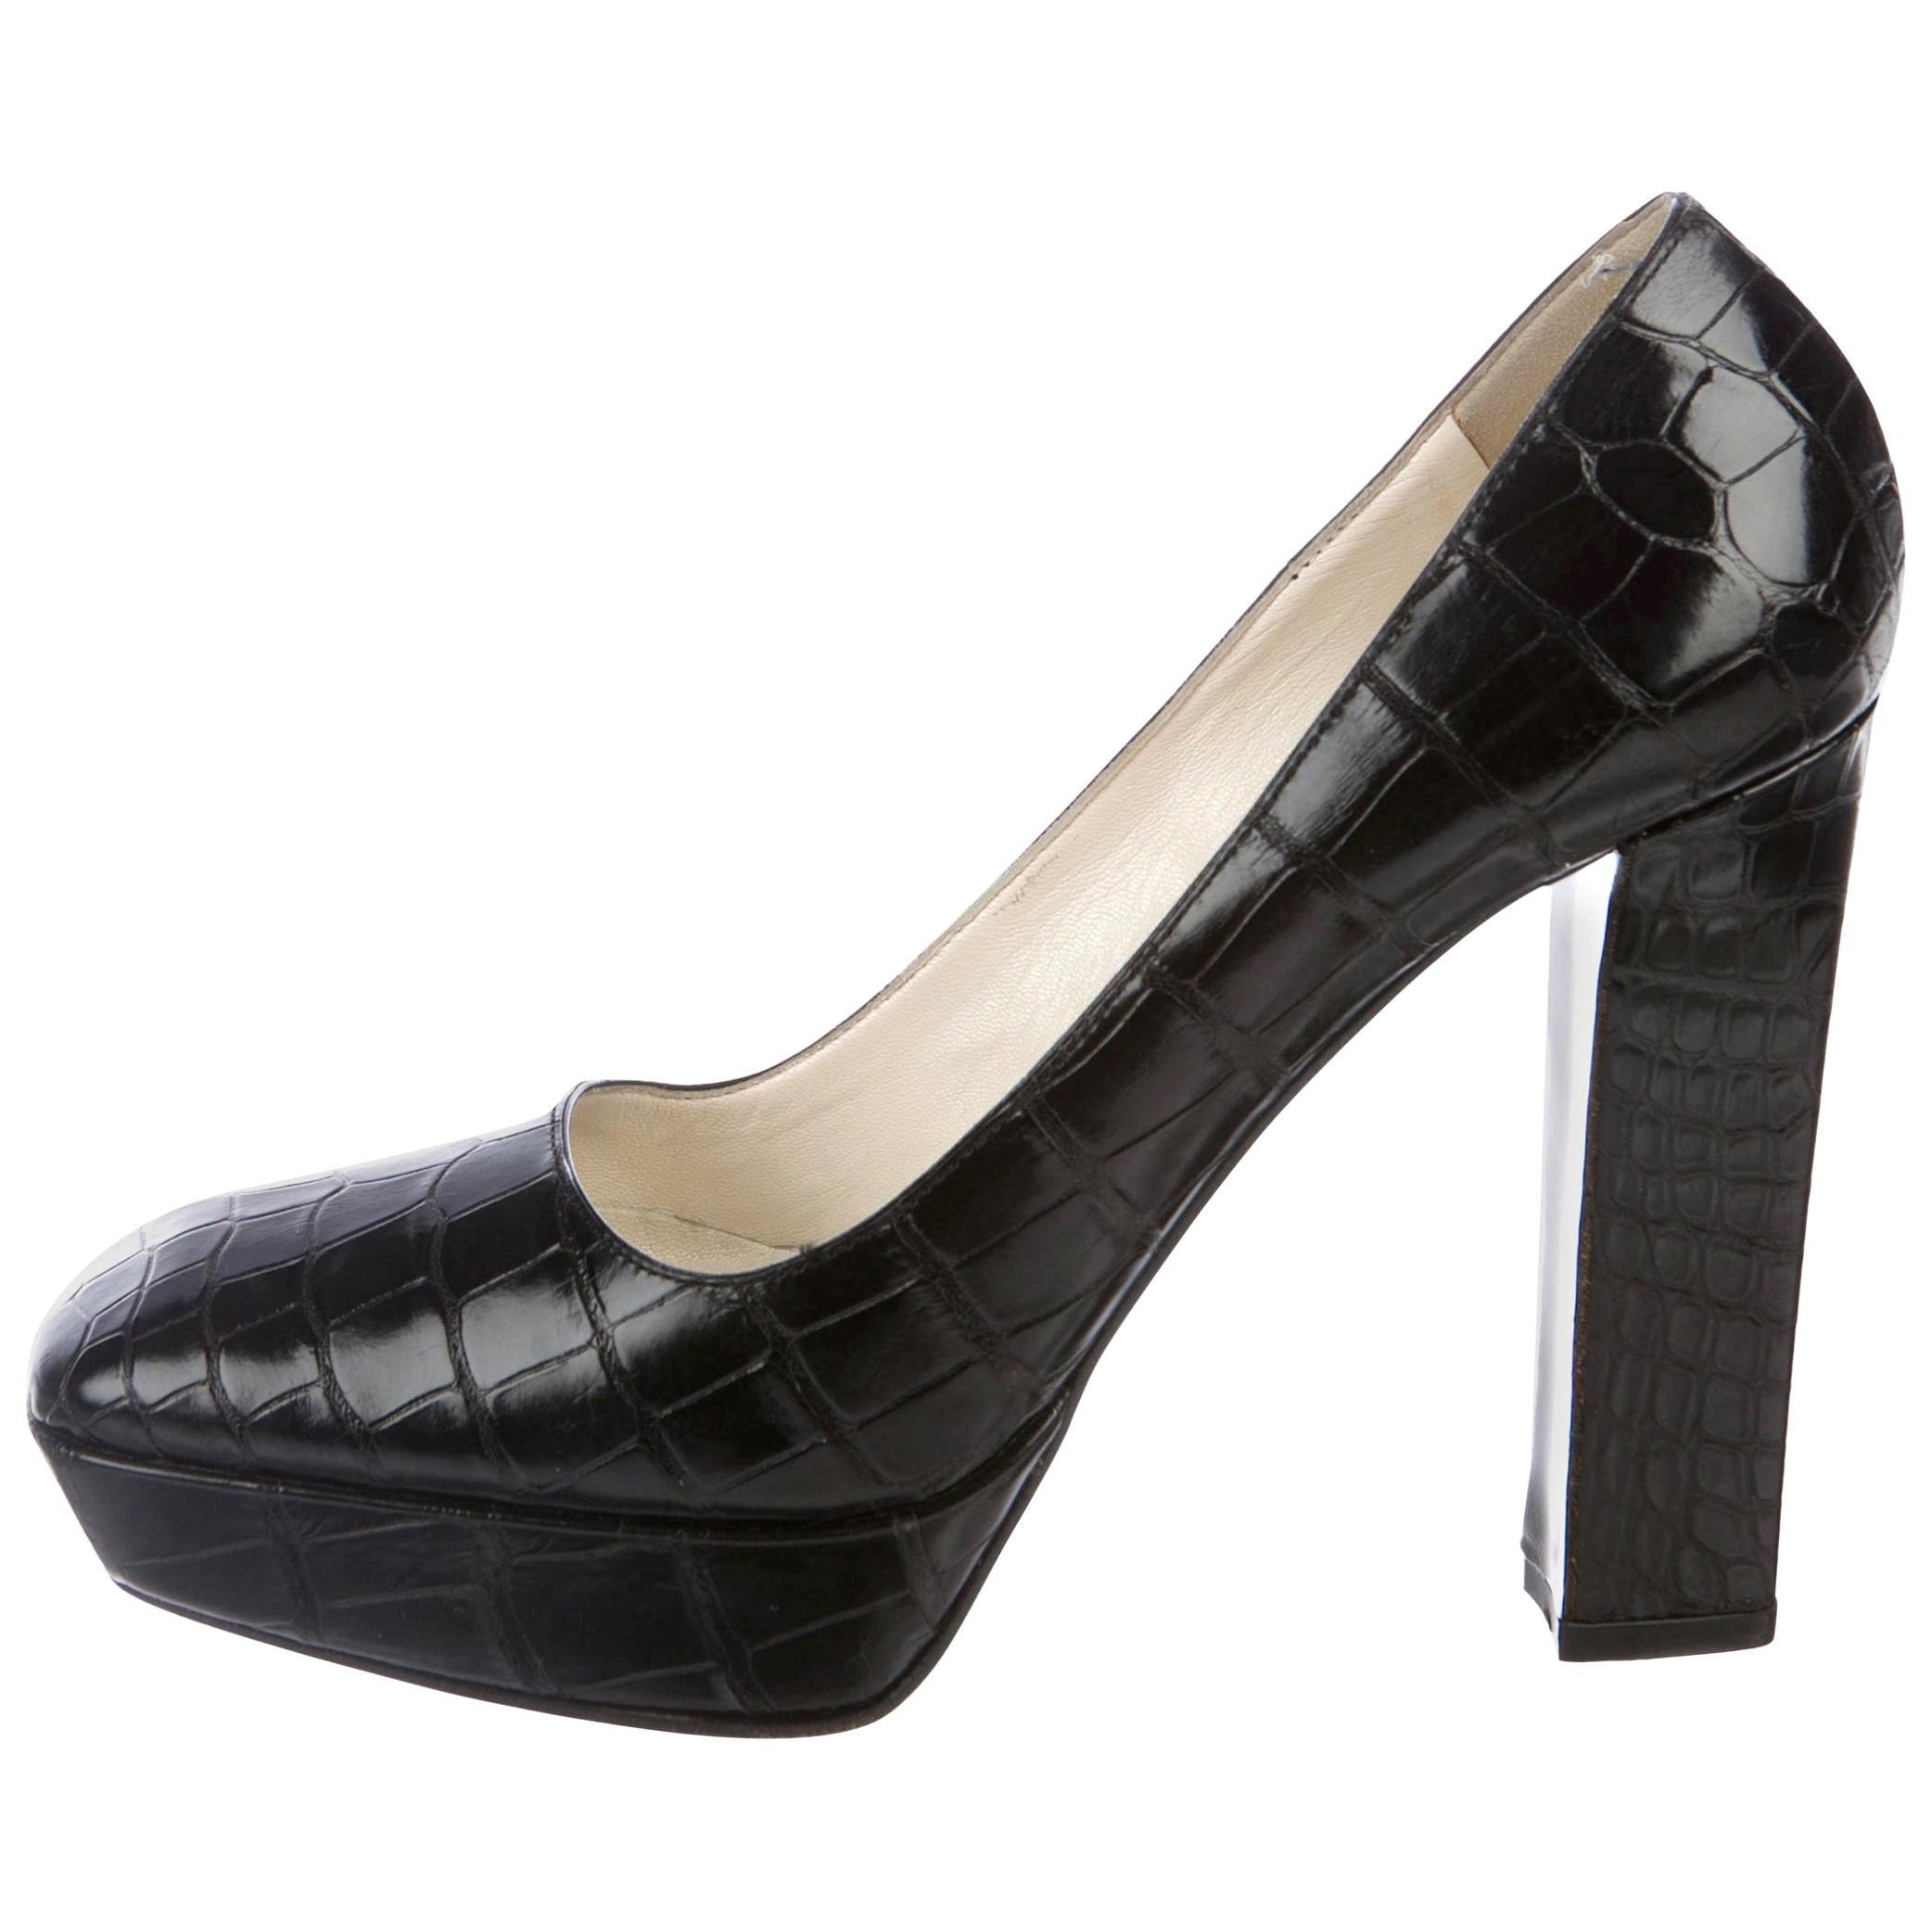 NEW Prada Black Exotic Skin Crocodile Platform High Heels Pumps